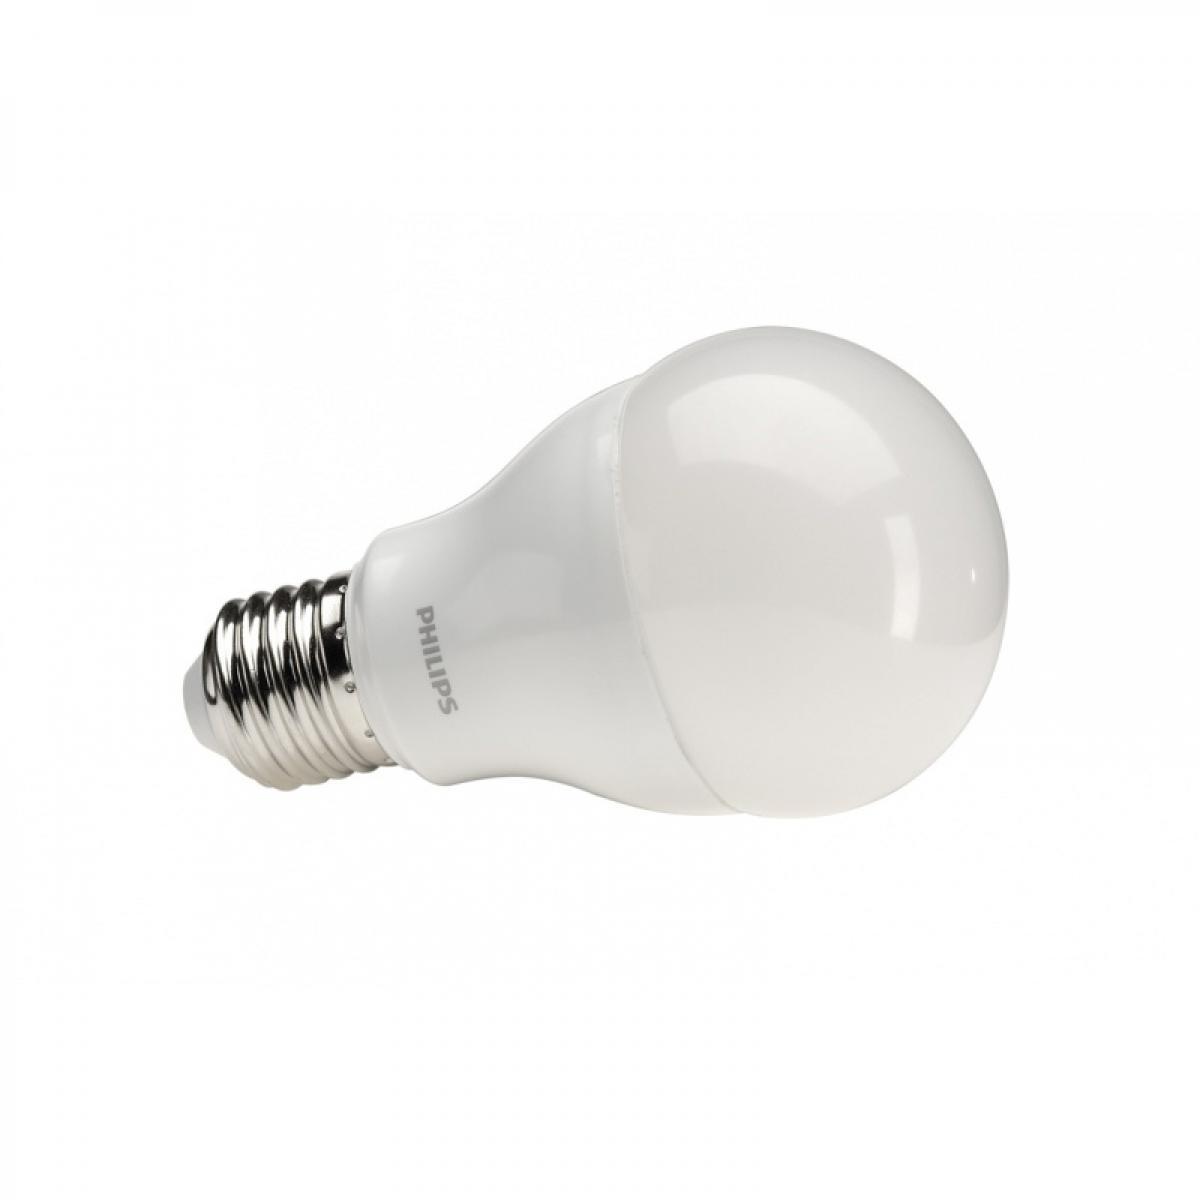 Slv Philips CorePro LED E27, 10W, 2700K, variable